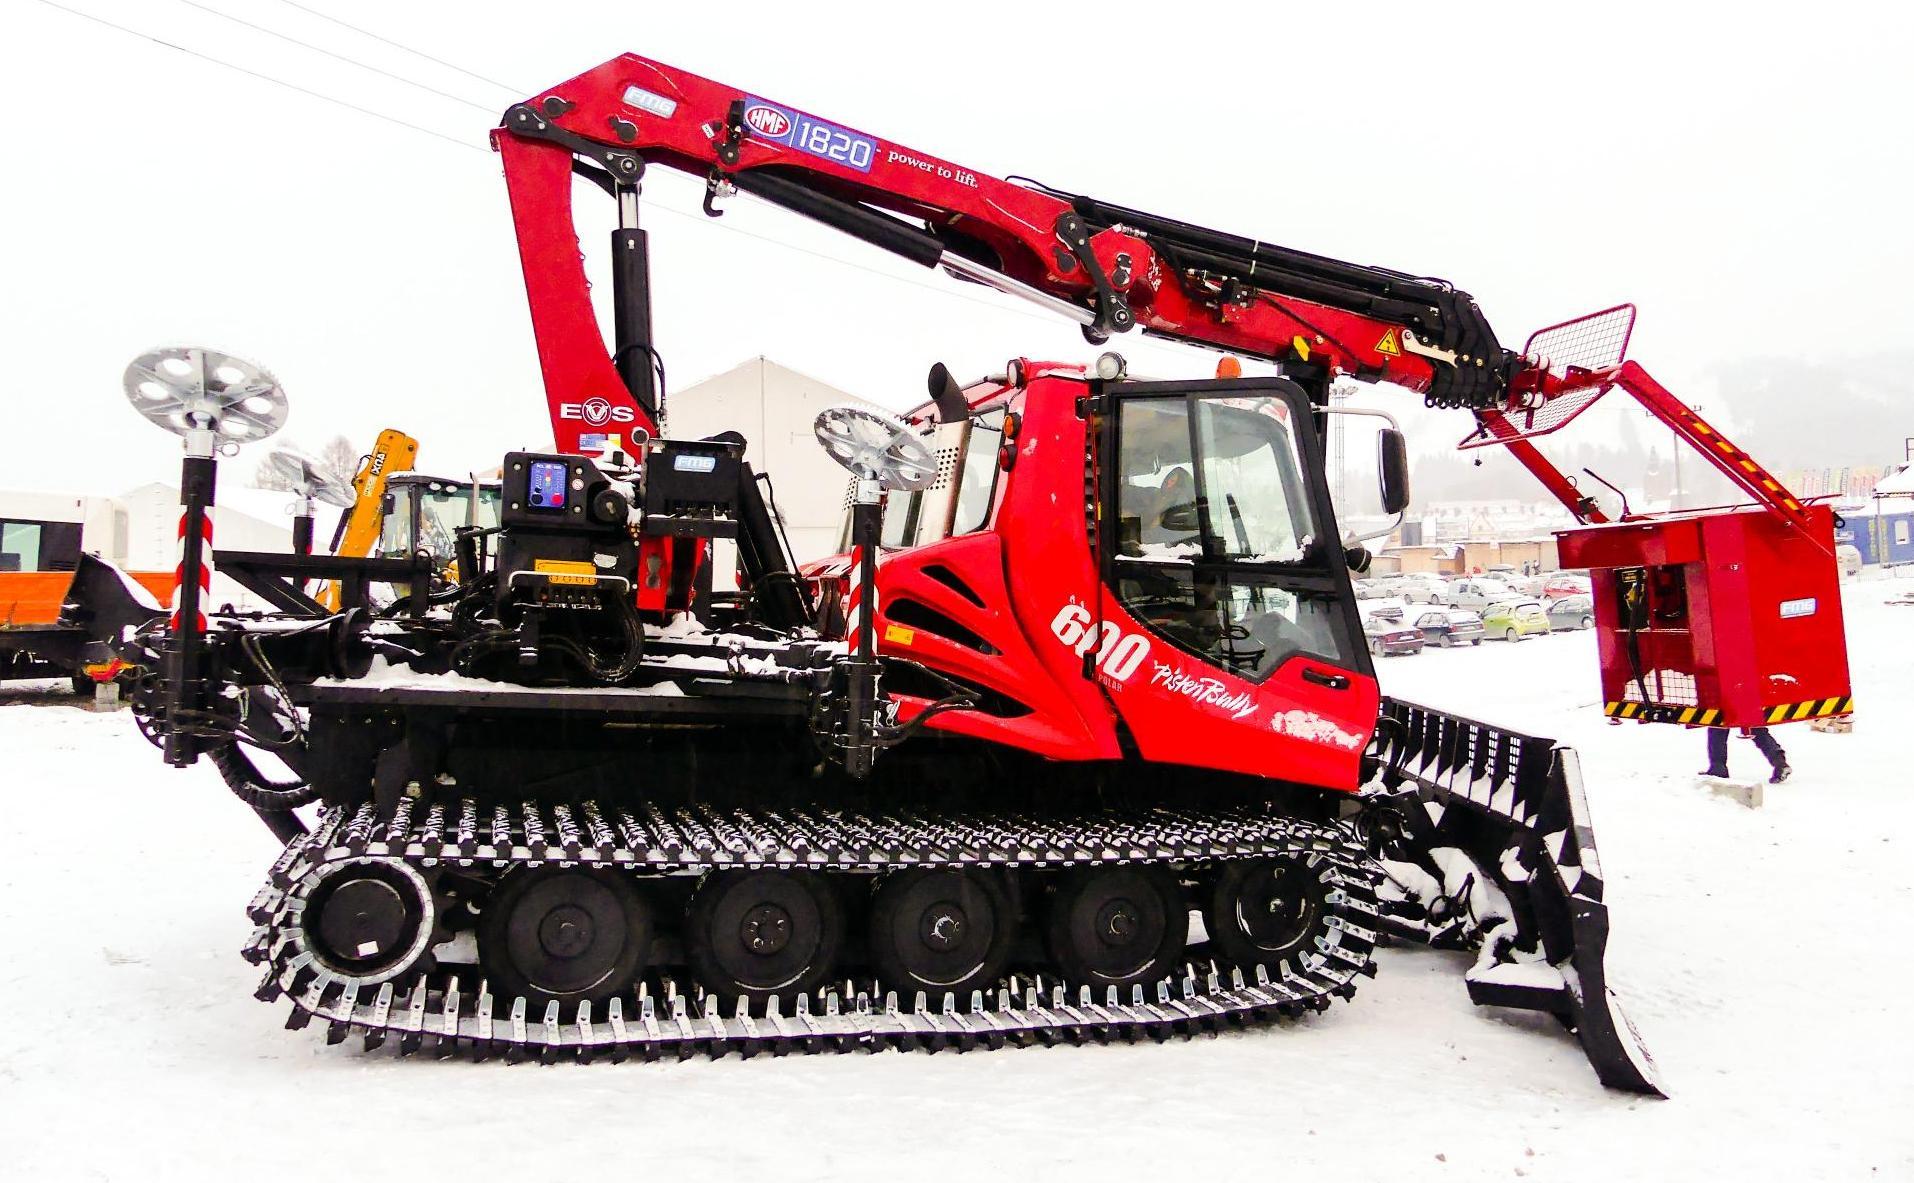 hmf1820